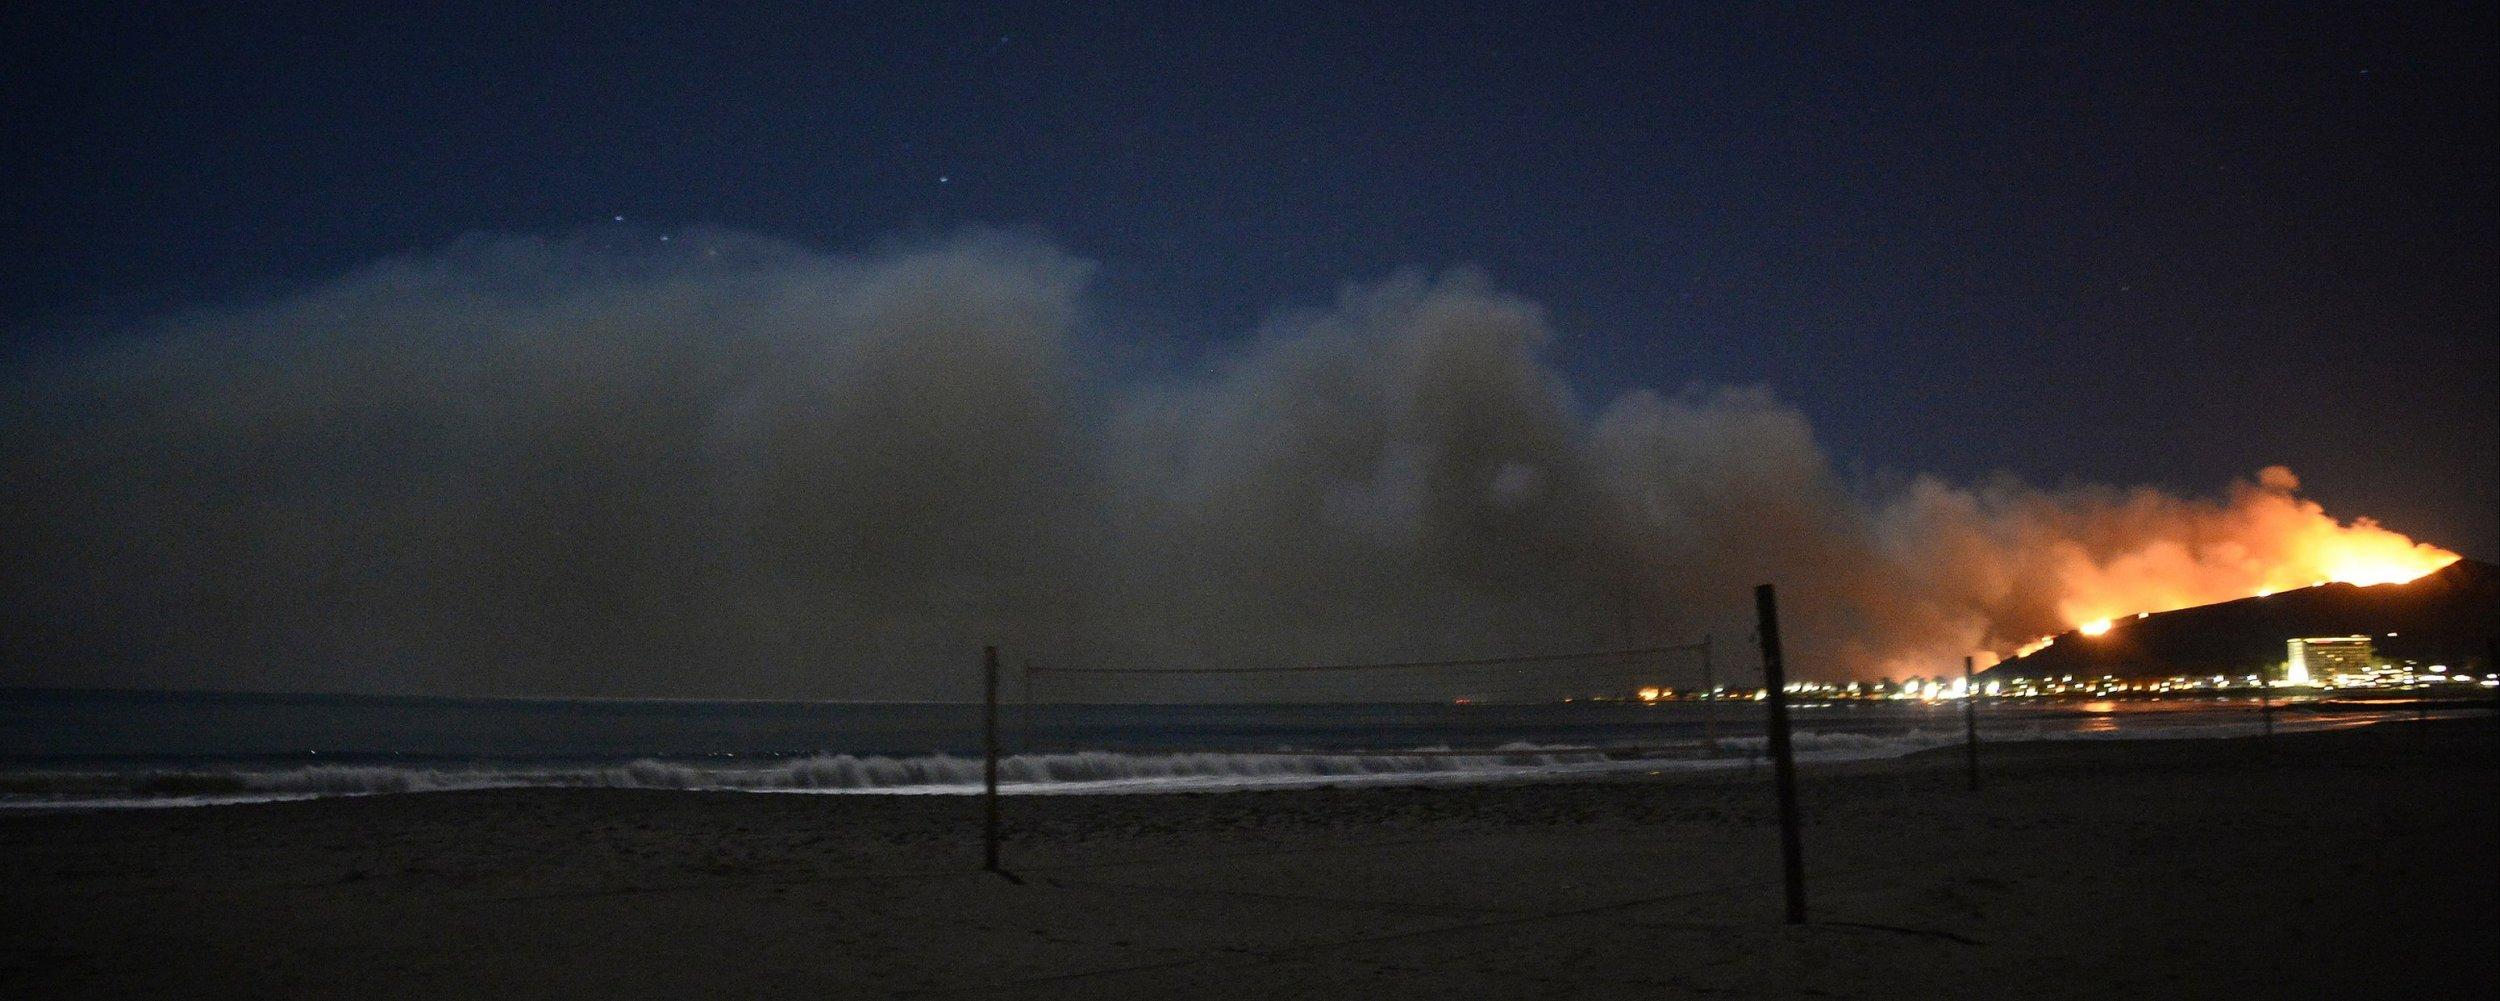 solimar wildfire california